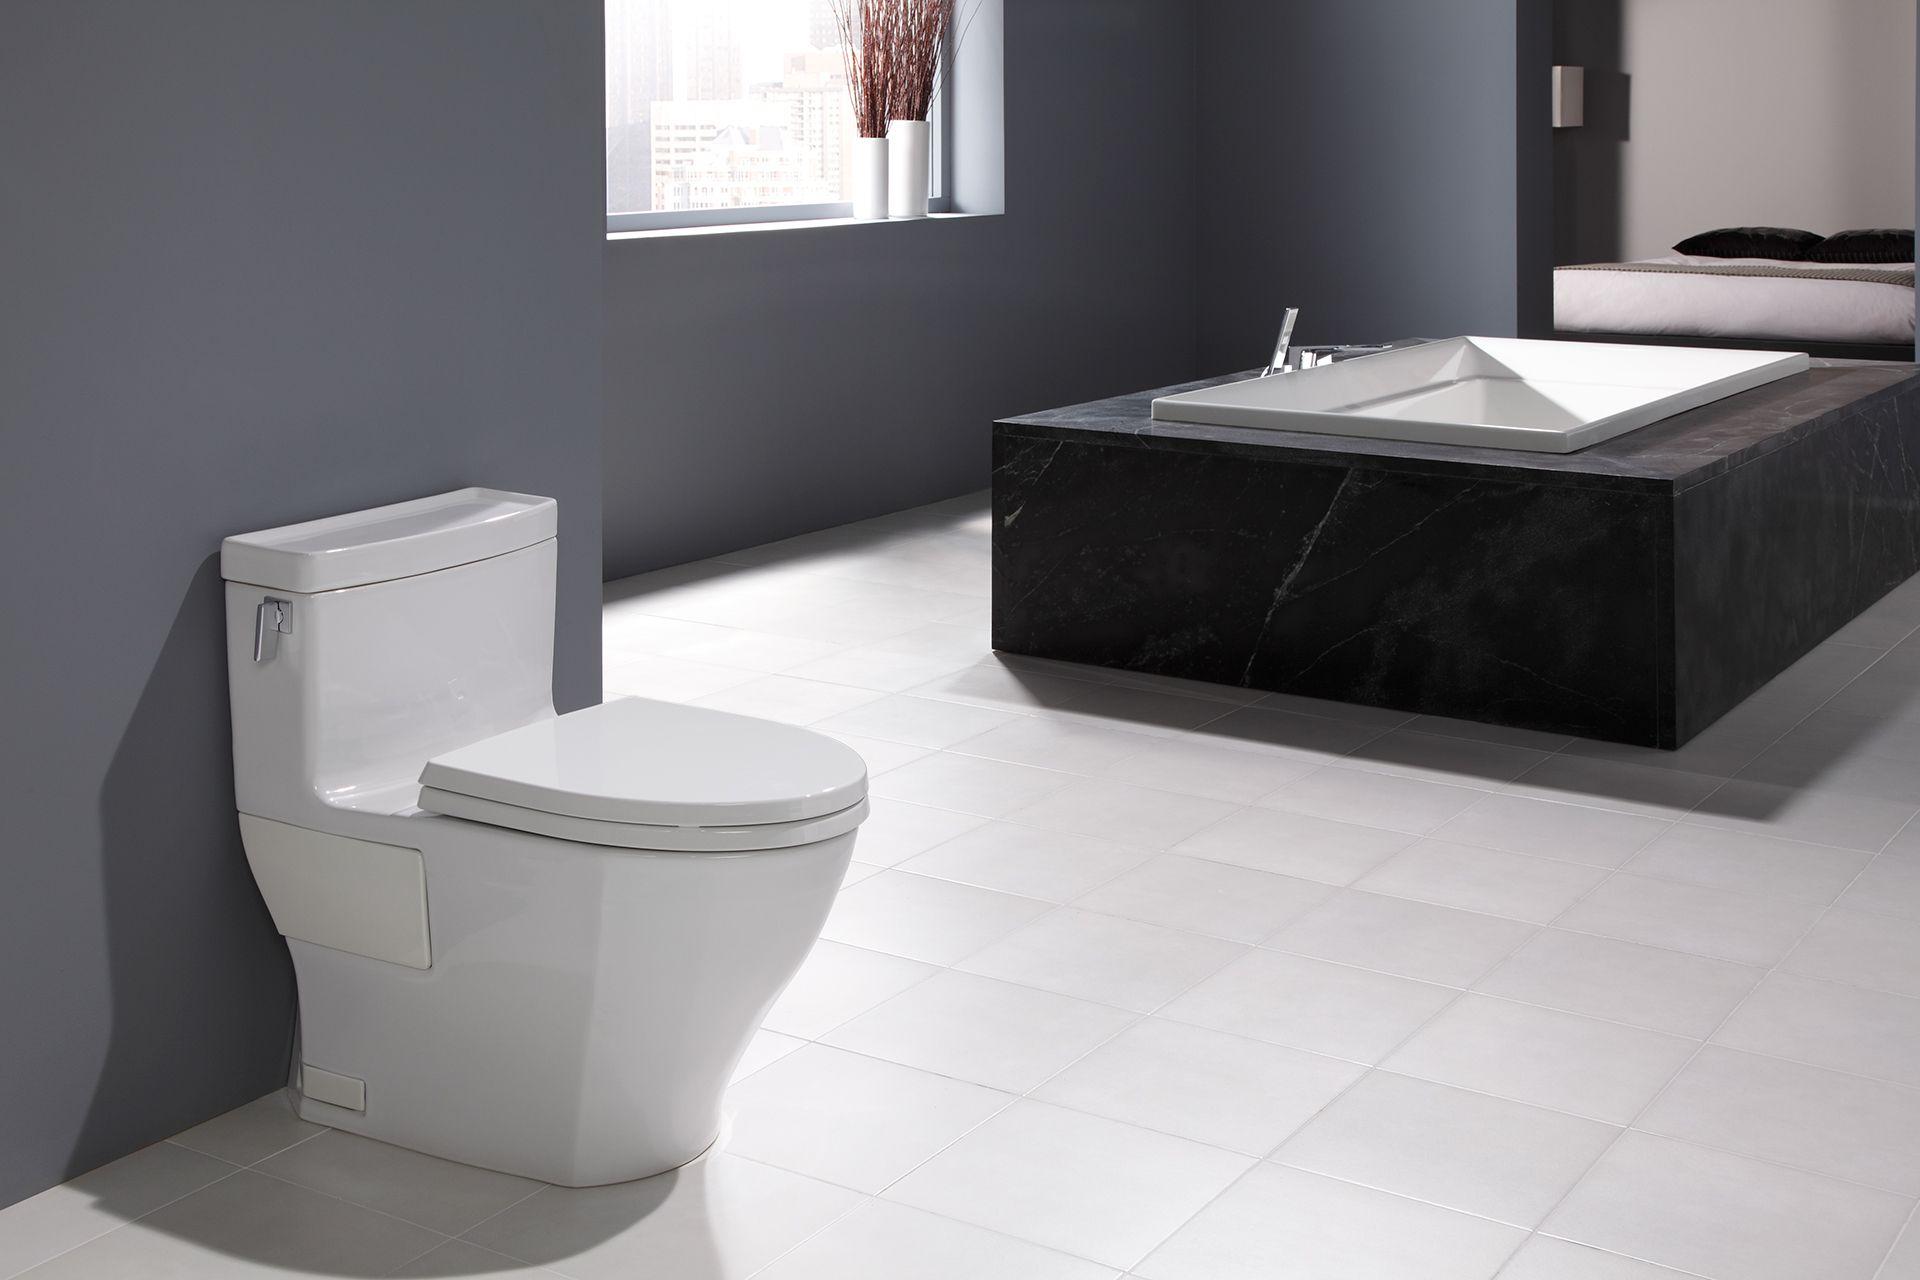 toto toilet seat installation manual